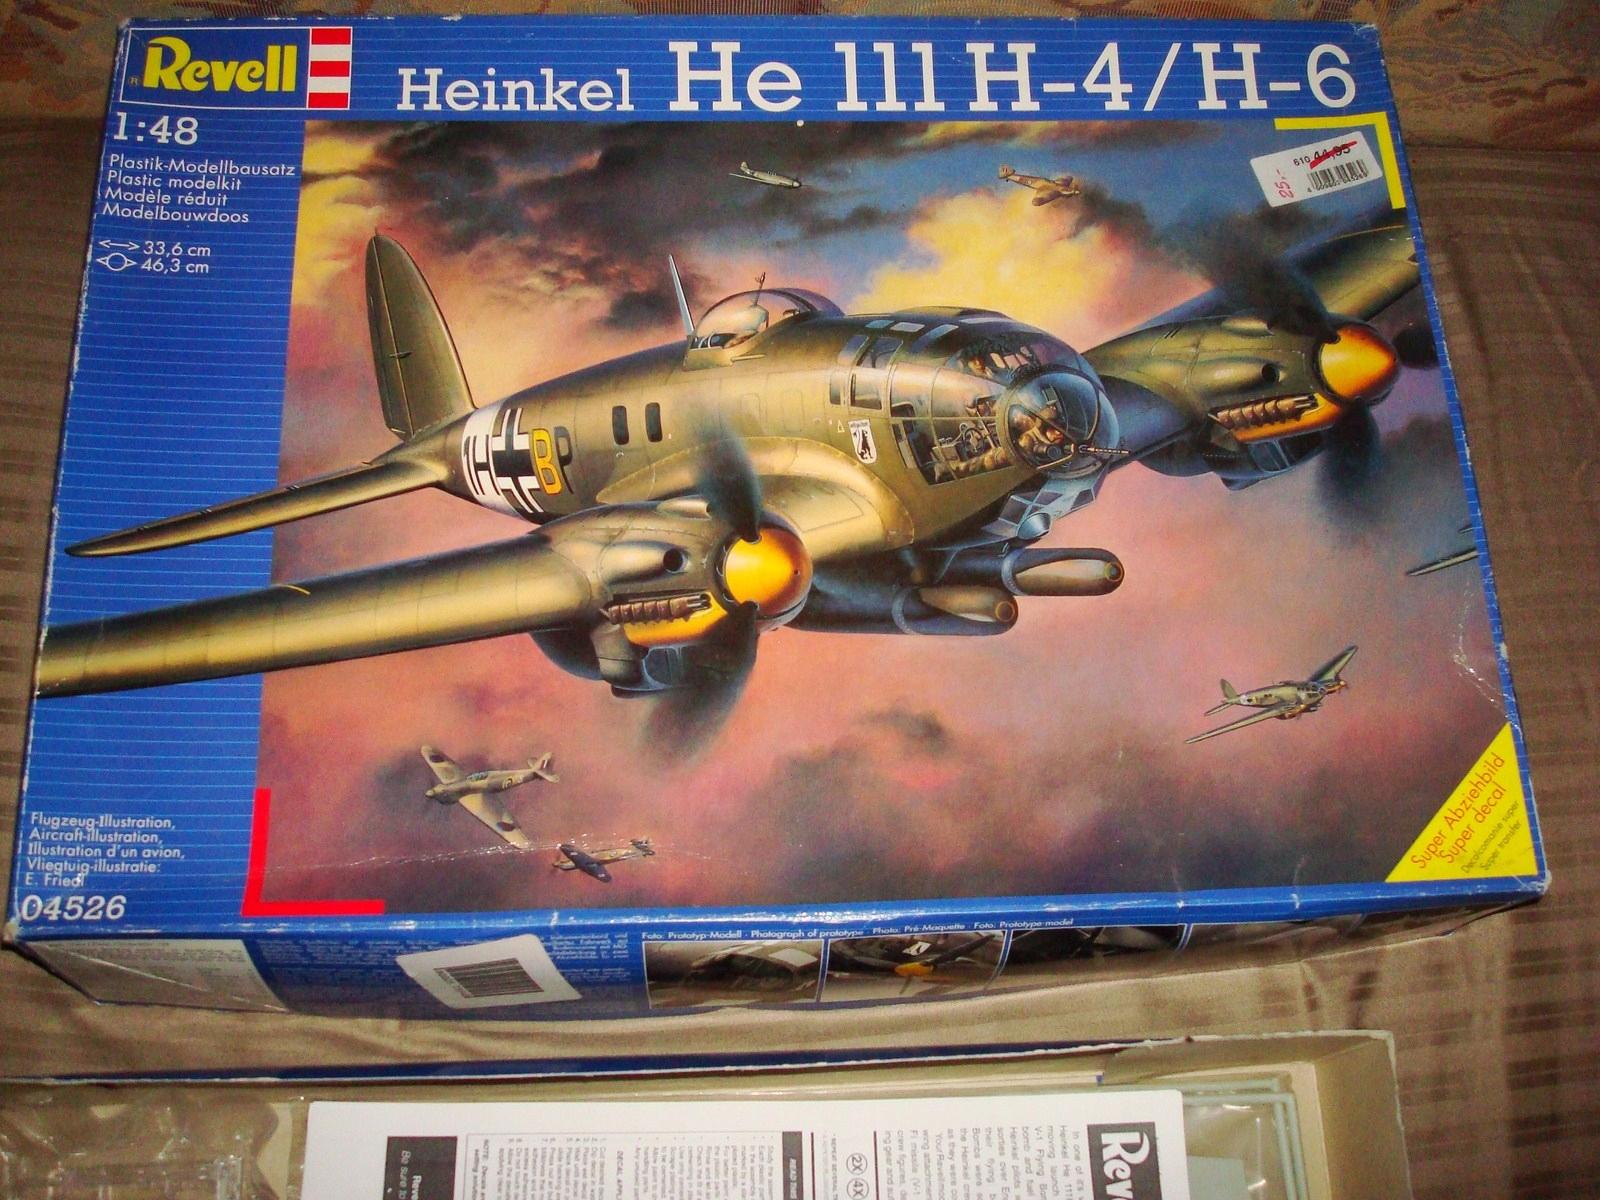 REVELL 1/48 04526 HEINKEL HE 111H-4/H-6 konwersja